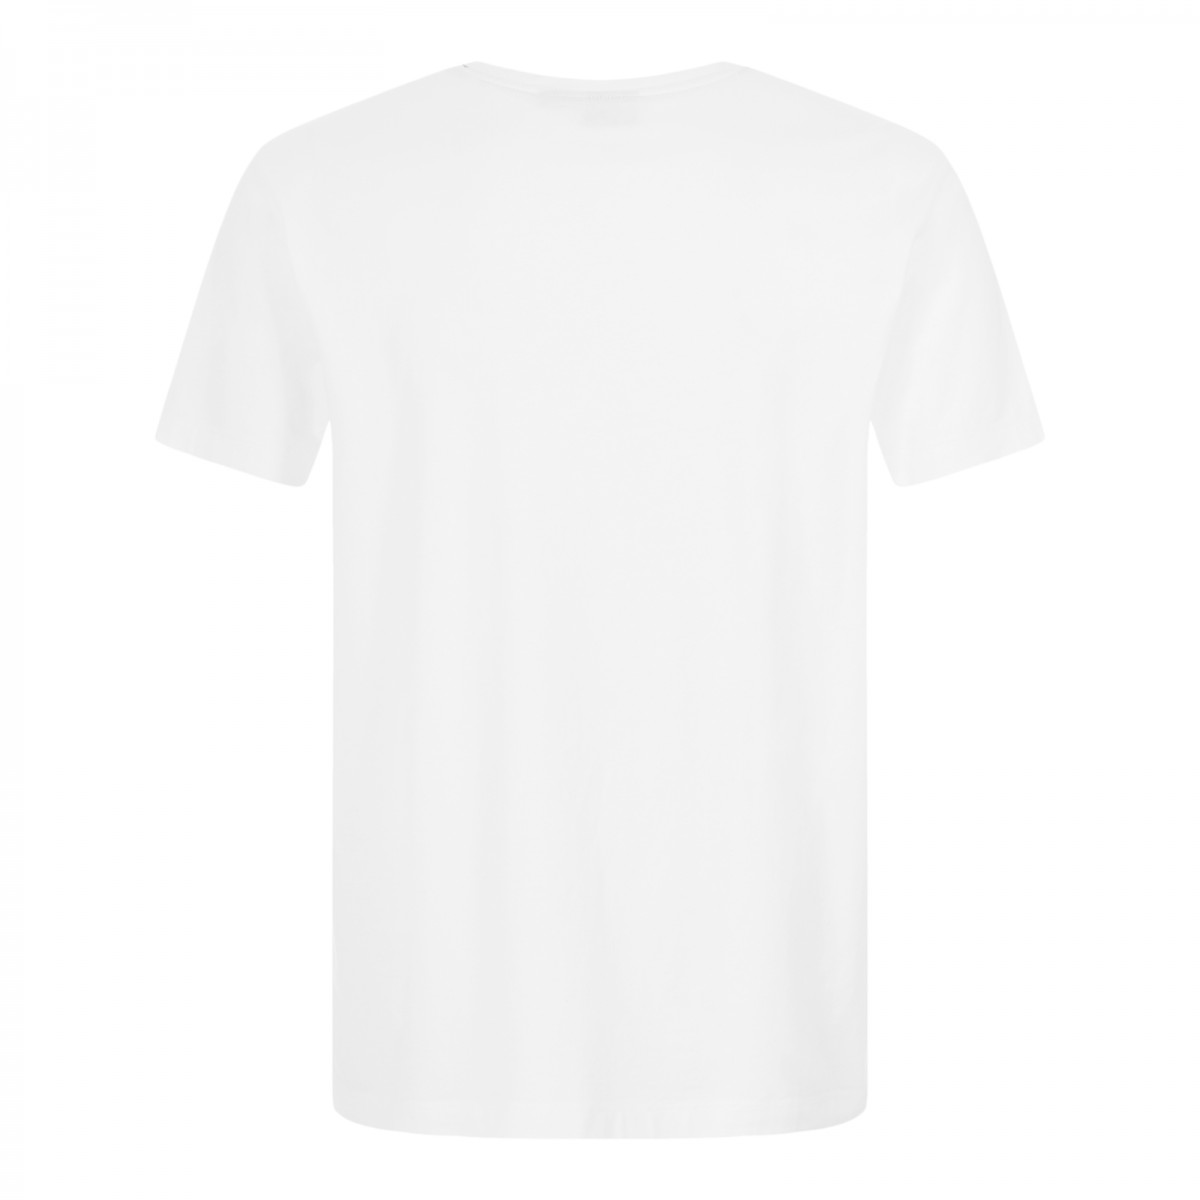 Koszulka MERC LONDON SOLWAY biała